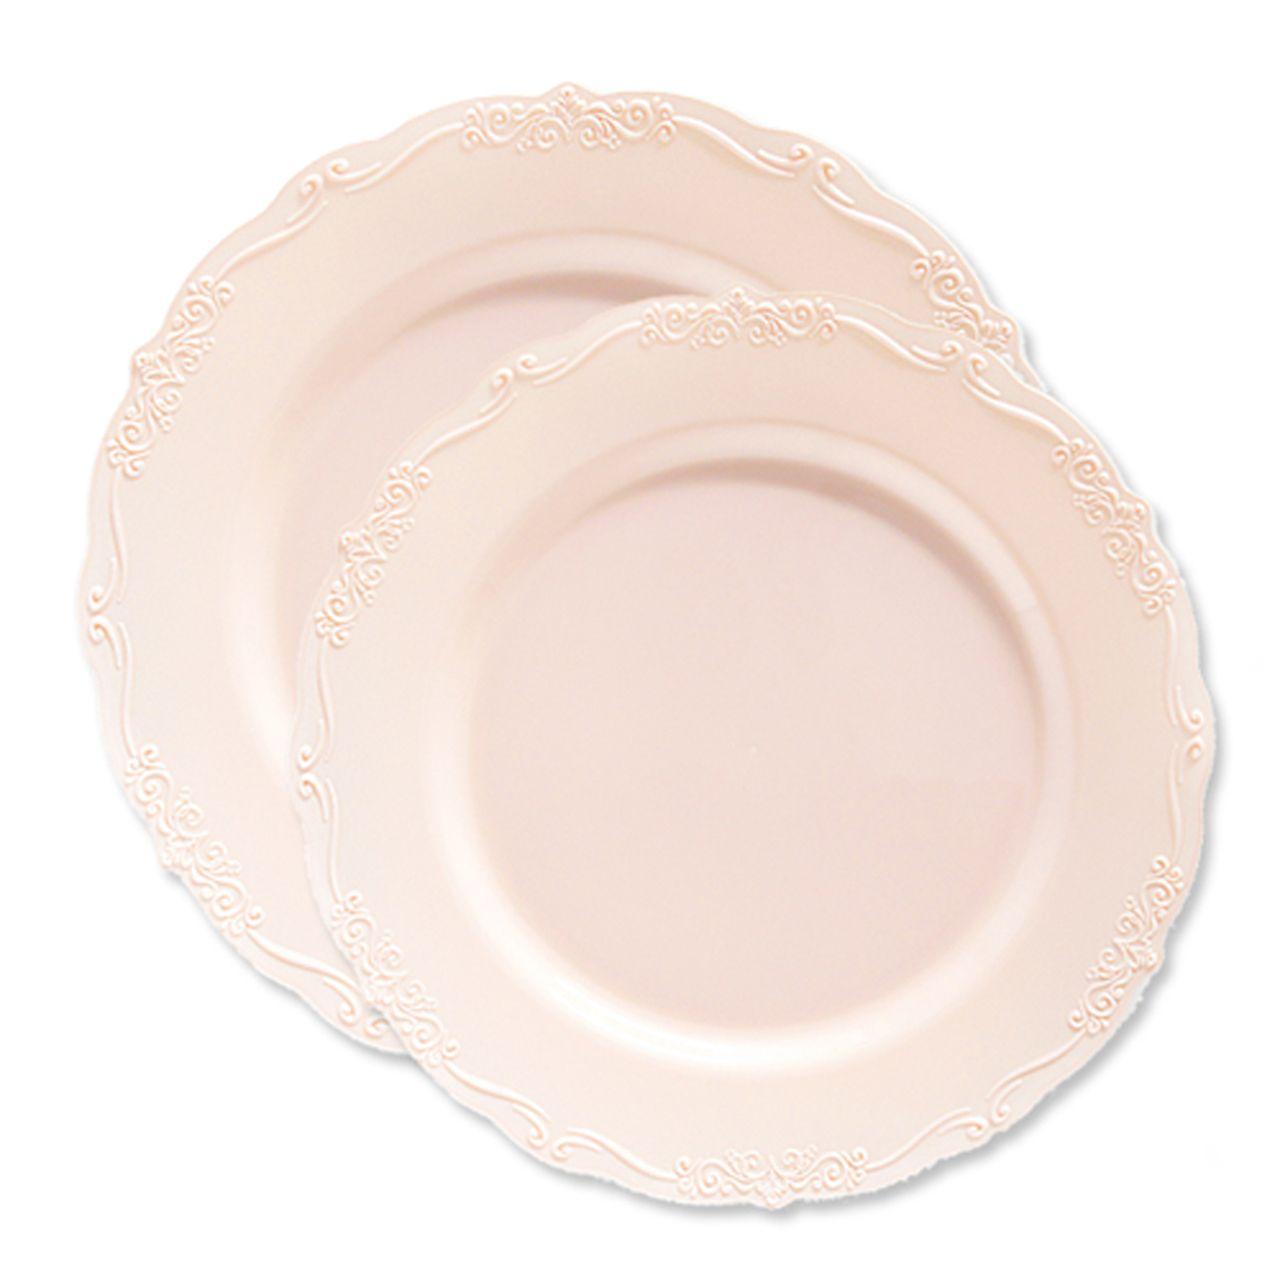 Casual Pink Embroidered Edge Plastic Plates Set Elegant Plastic Dinnerware Plastic Plates Wedding Disposable Wedding Tableware